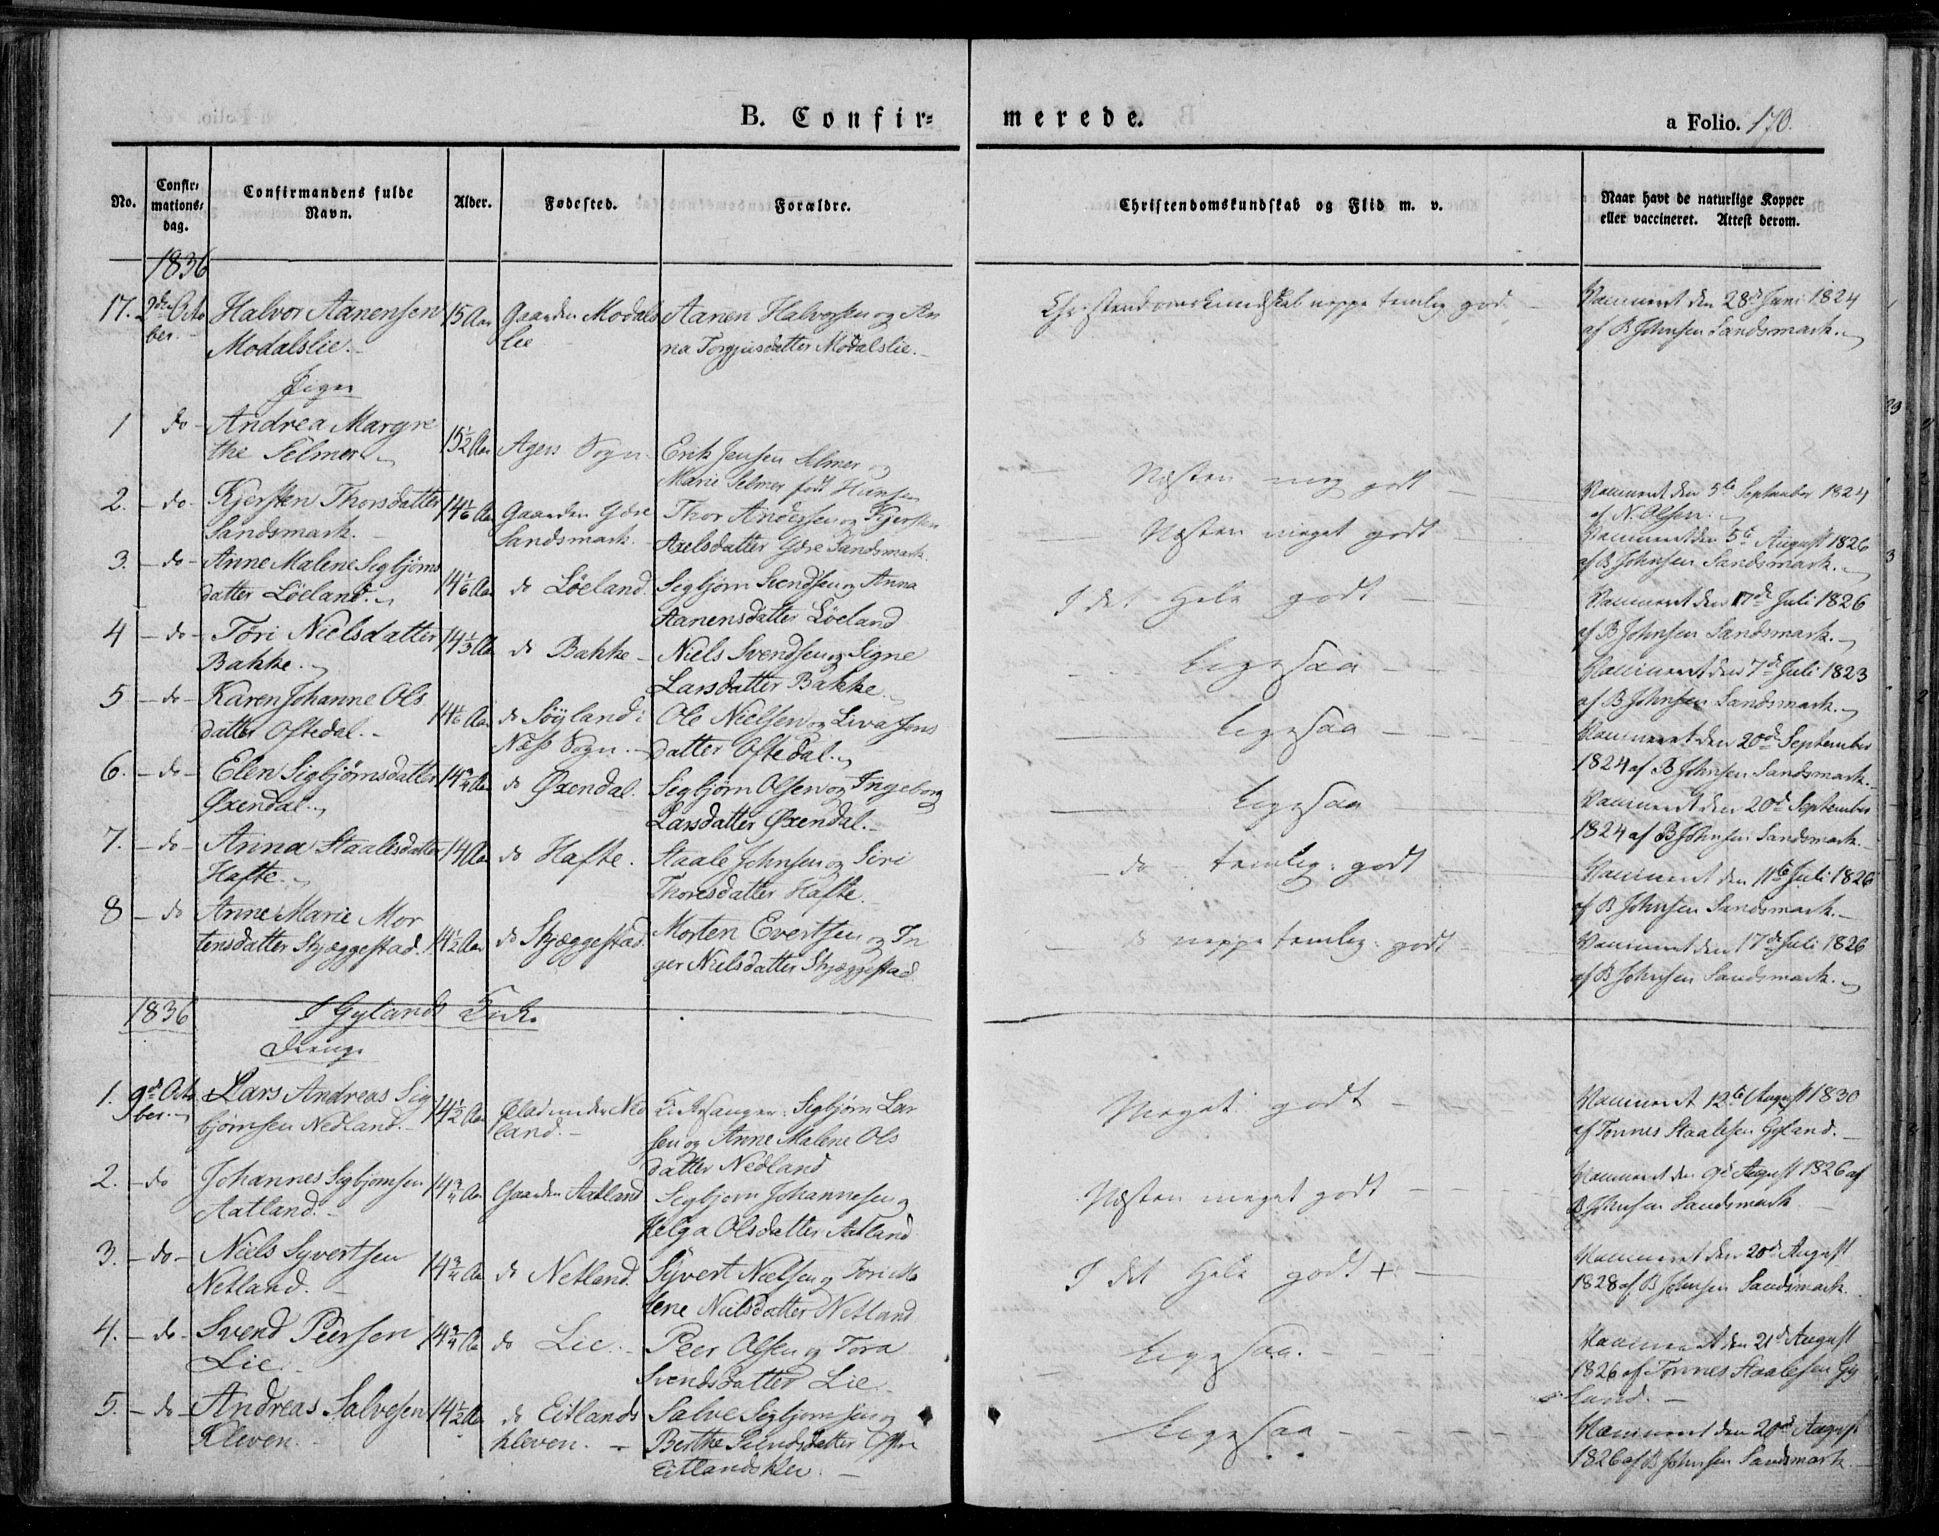 SAK, Bakke sokneprestkontor, F/Fa/Faa/L0004: Ministerialbok nr. A 4, 1834-1846, s. 170